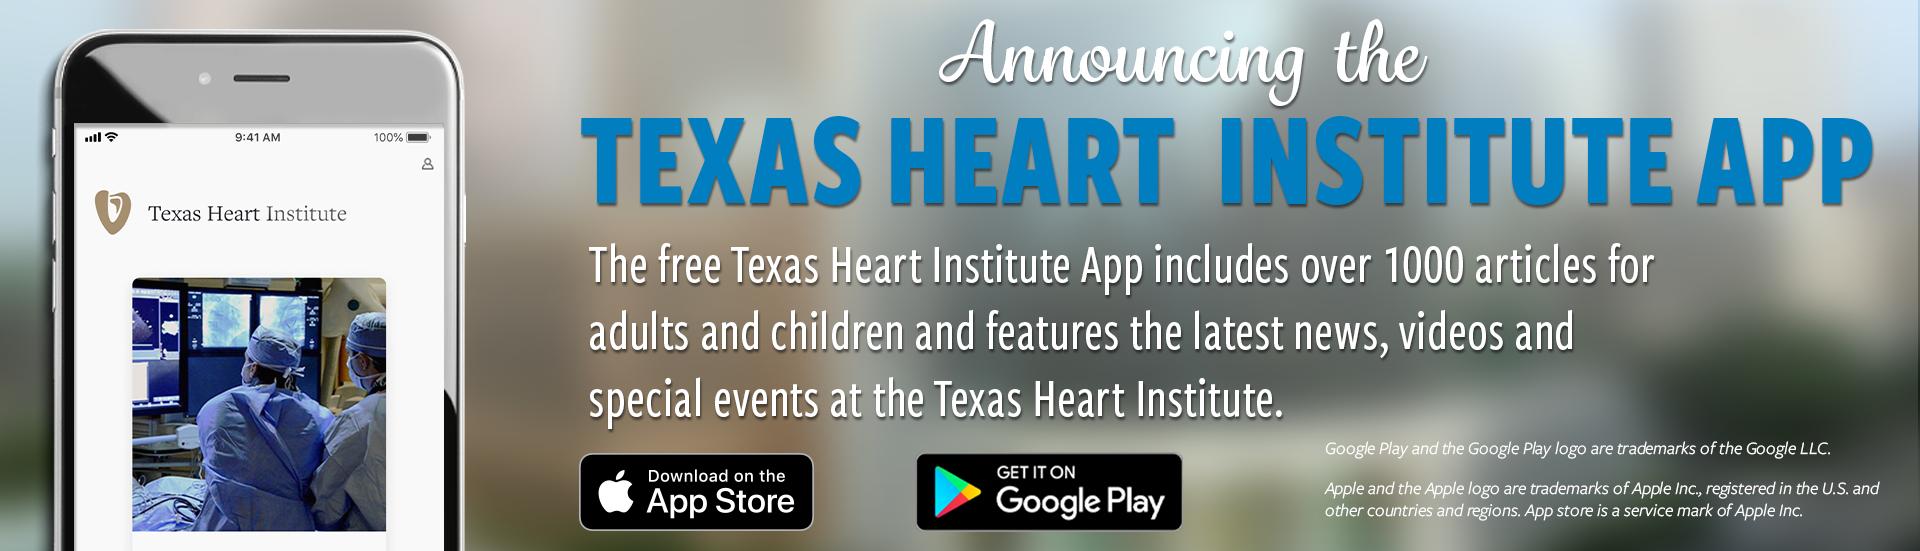 Announcing Texas Heart Institute App